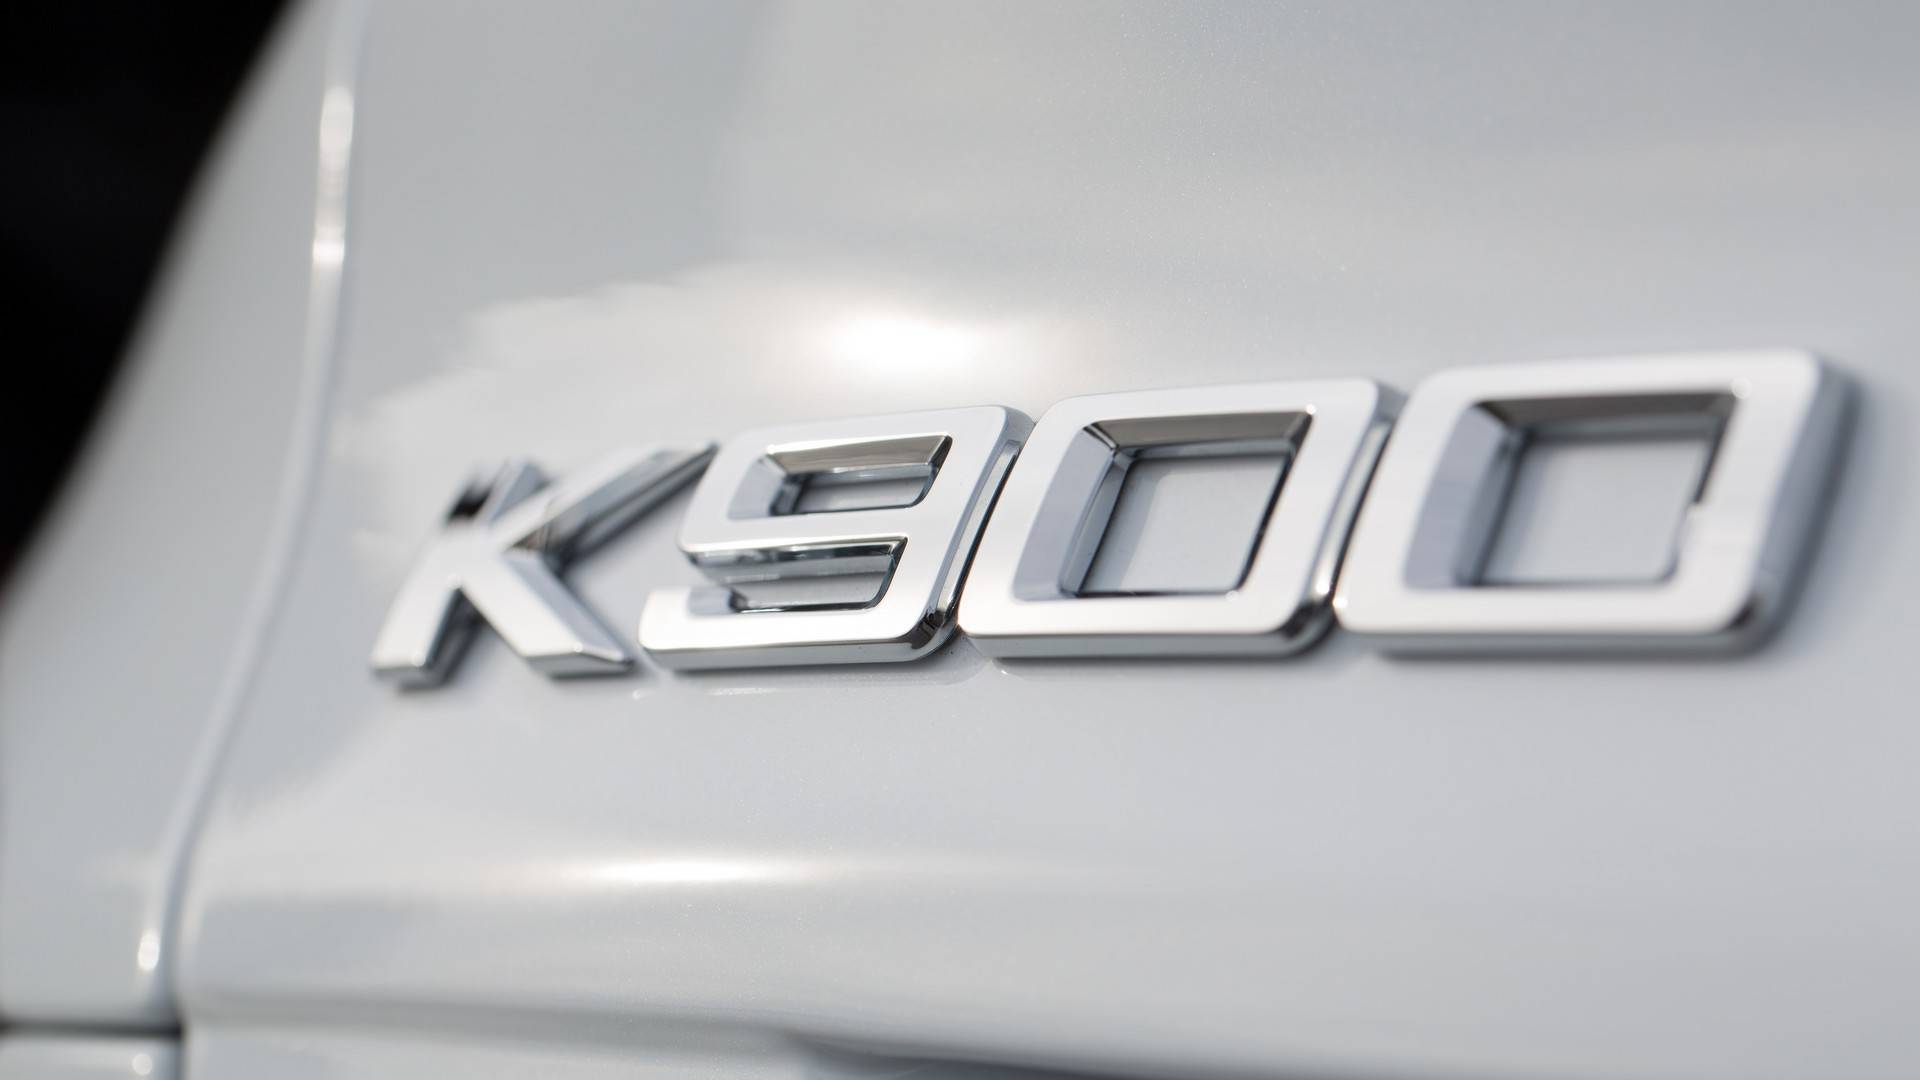 2019 K900